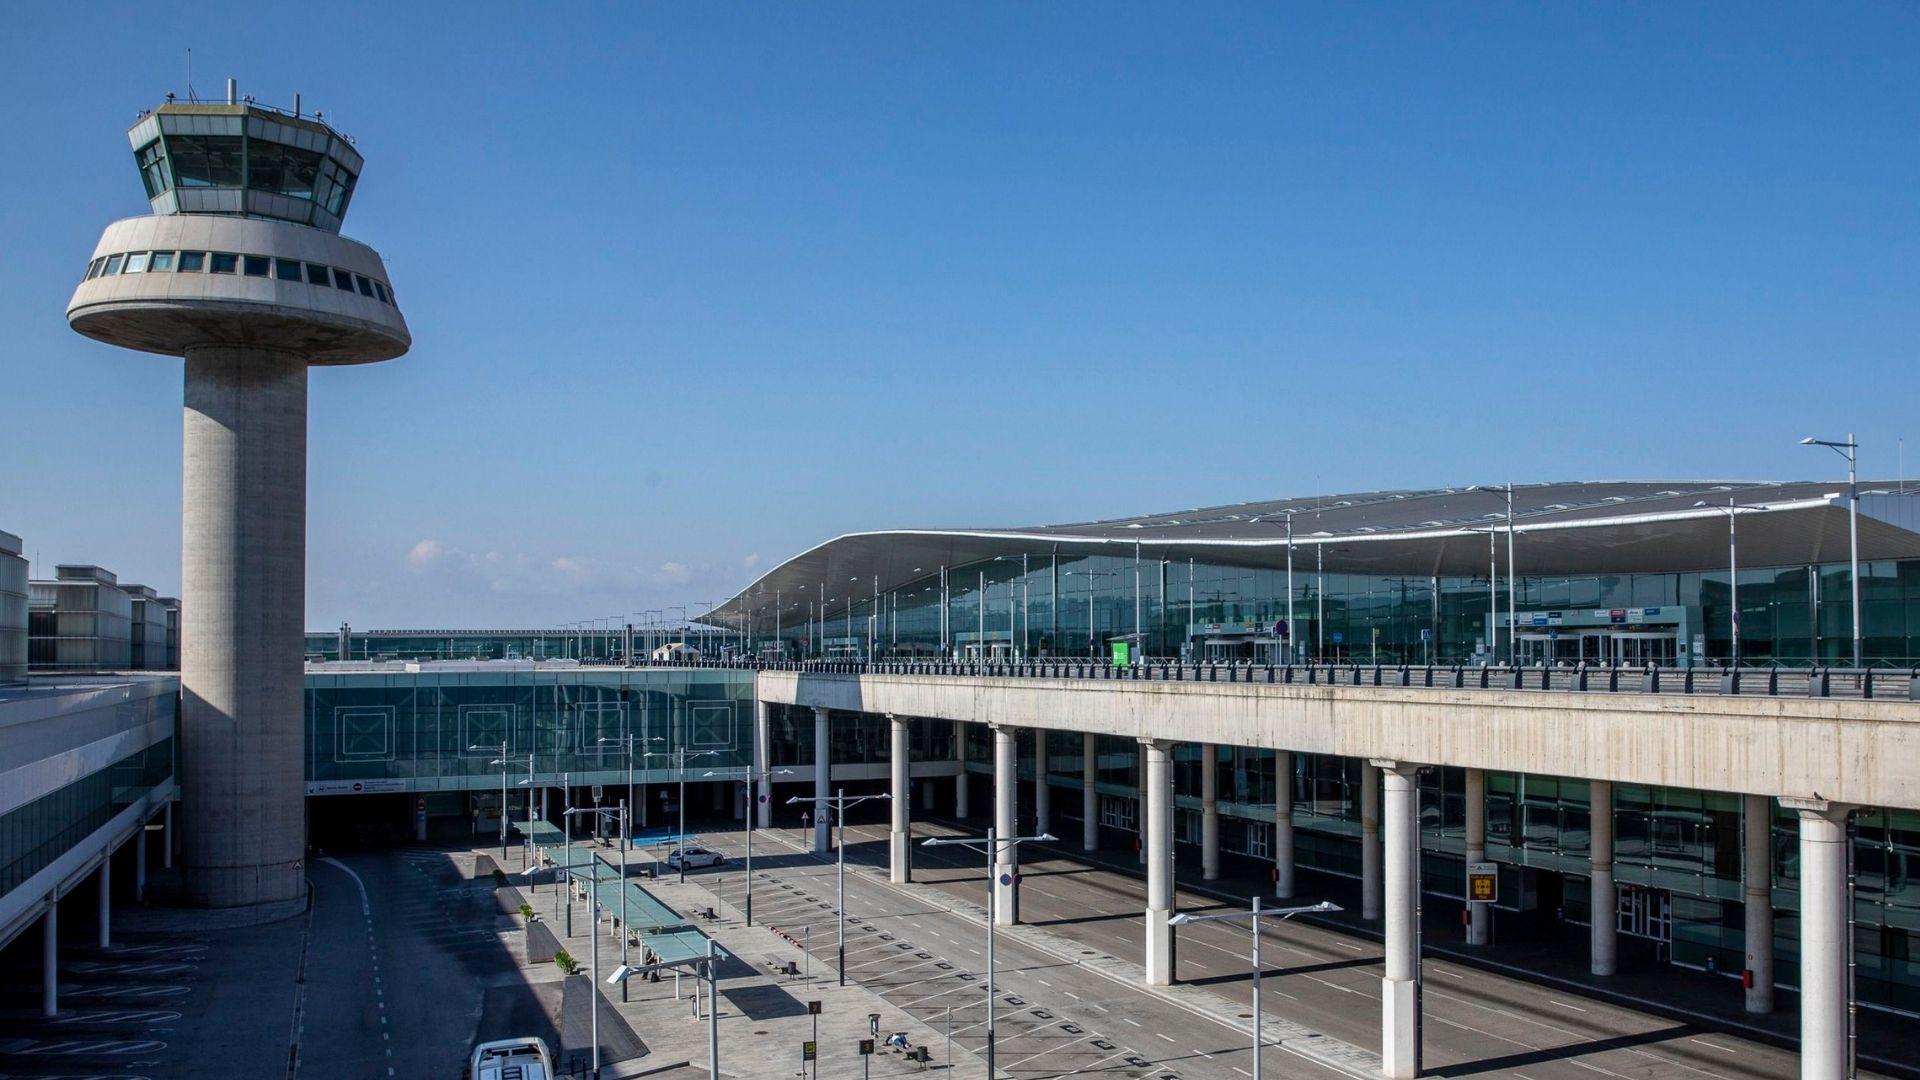 aeroport prat t1 torre control